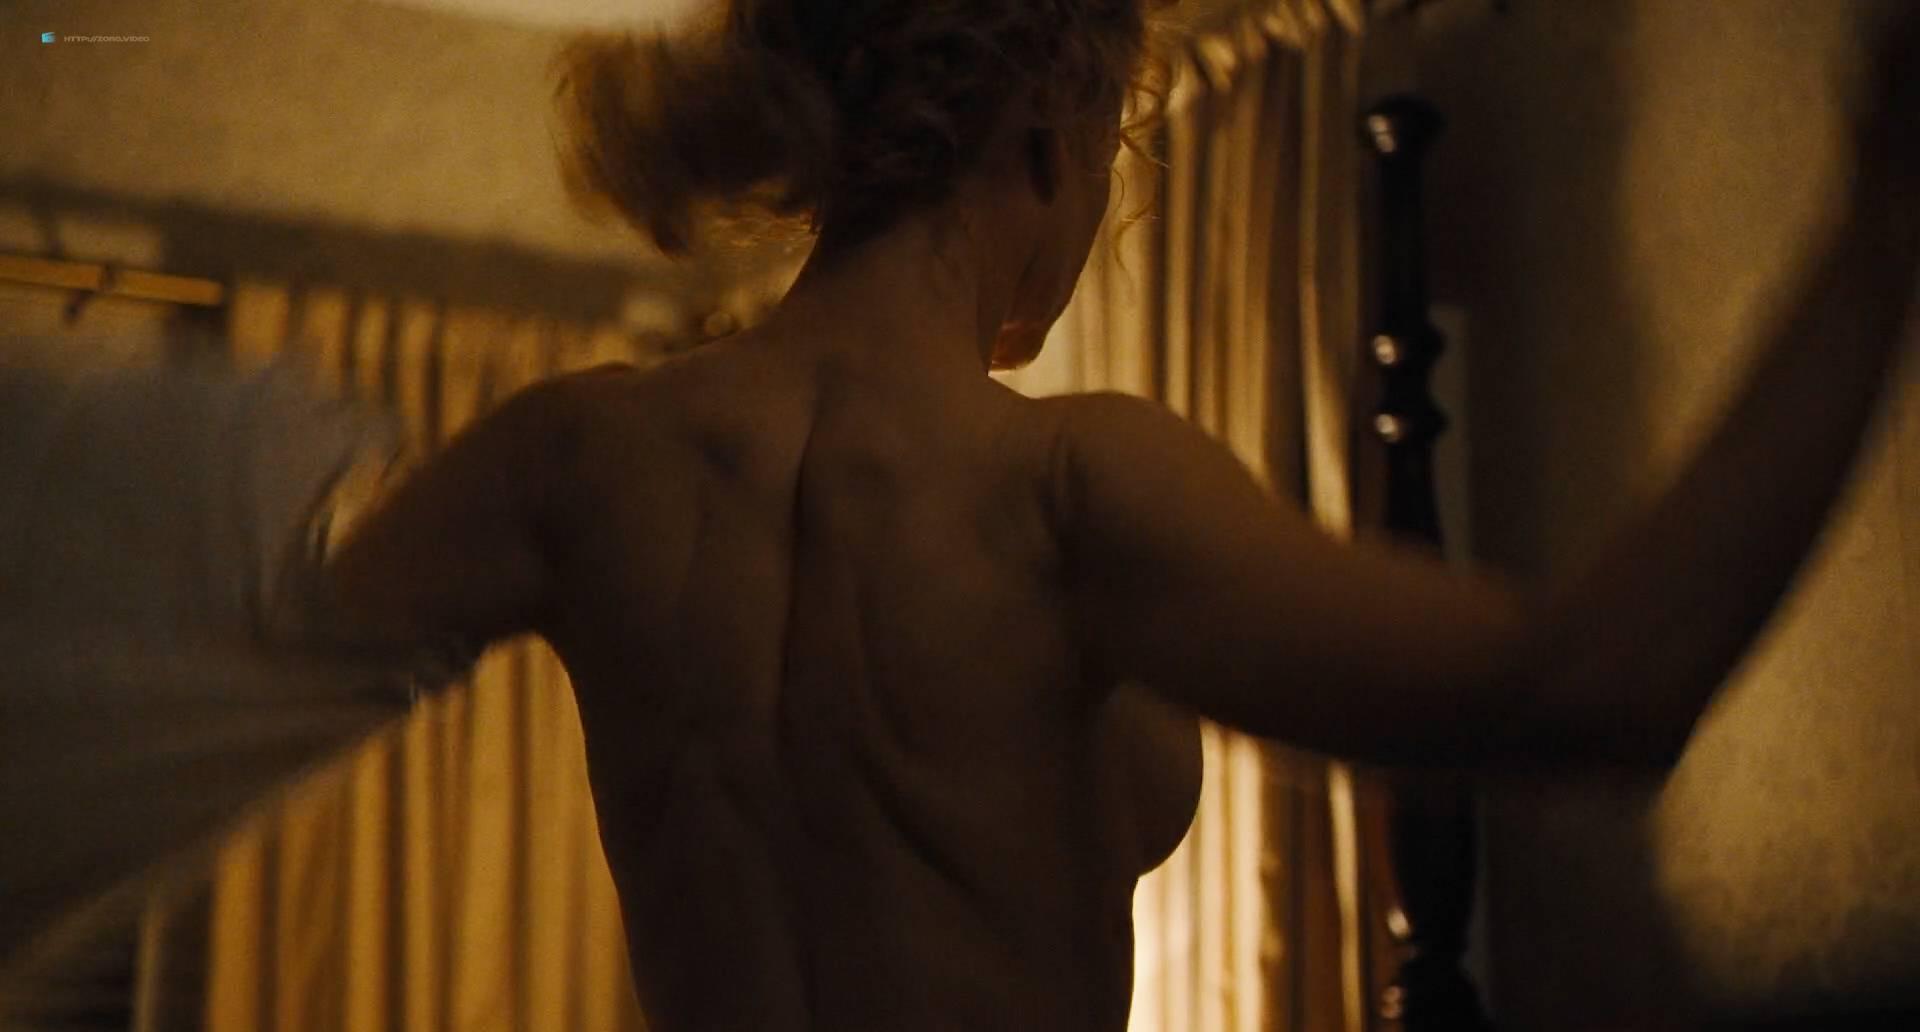 Nicole Kidman nude bush and boobs - The Killing of a Sacred Deer (2017) HD 1080p (6)